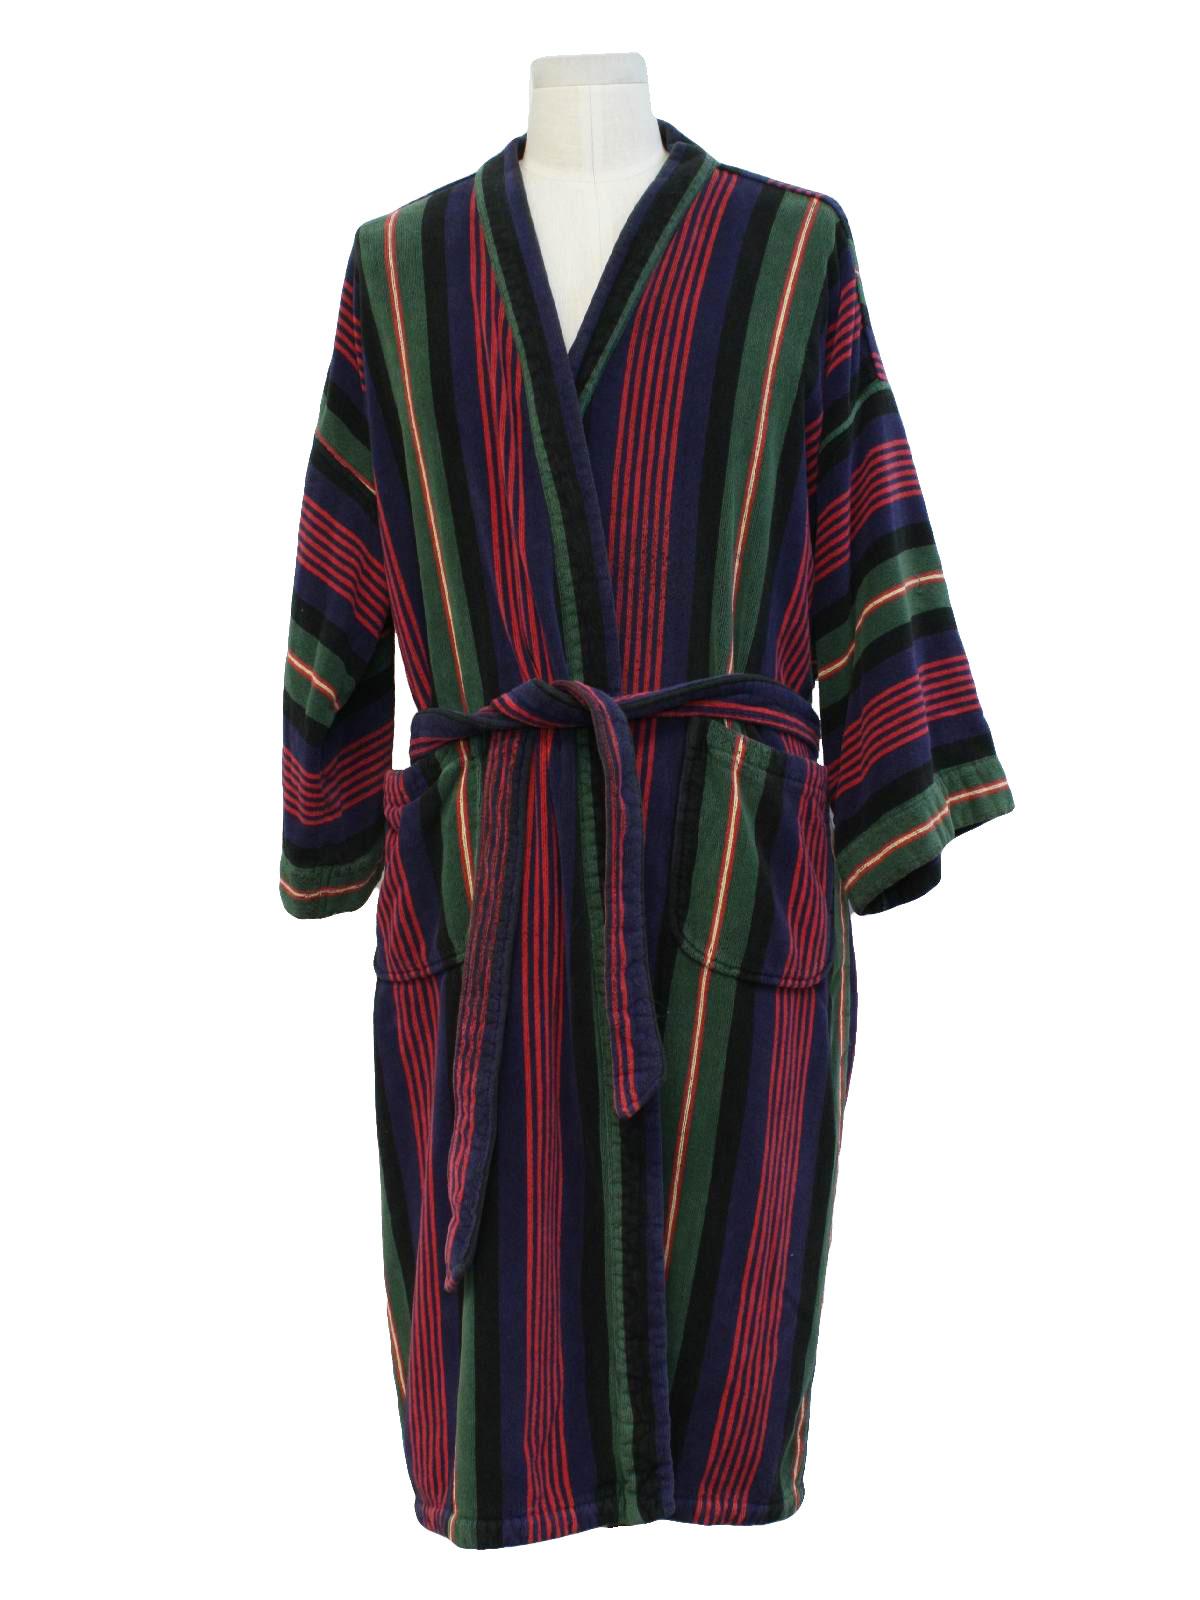 1980's Mens Robe (Norm Thompson): 80s -Norm Thompson- Mens ... | 1200 x 1600 jpeg 170kB